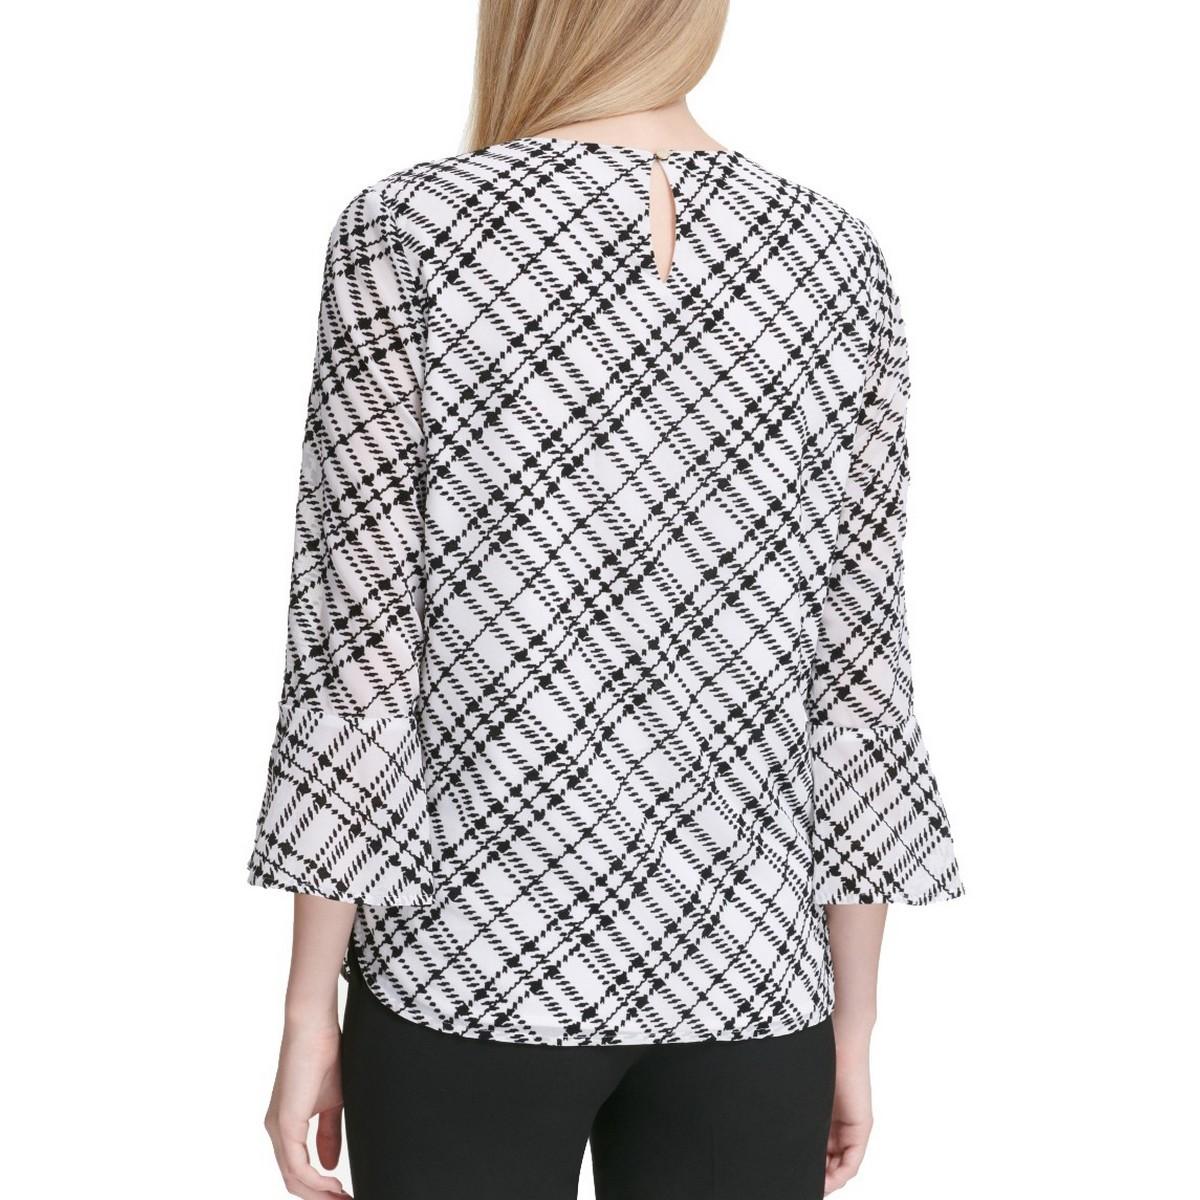 CALVIN-KLEIN-NEW-Women-039-s-Printed-Bell-sleeve-Blouse-Shirt-Top-TEDO thumbnail 6